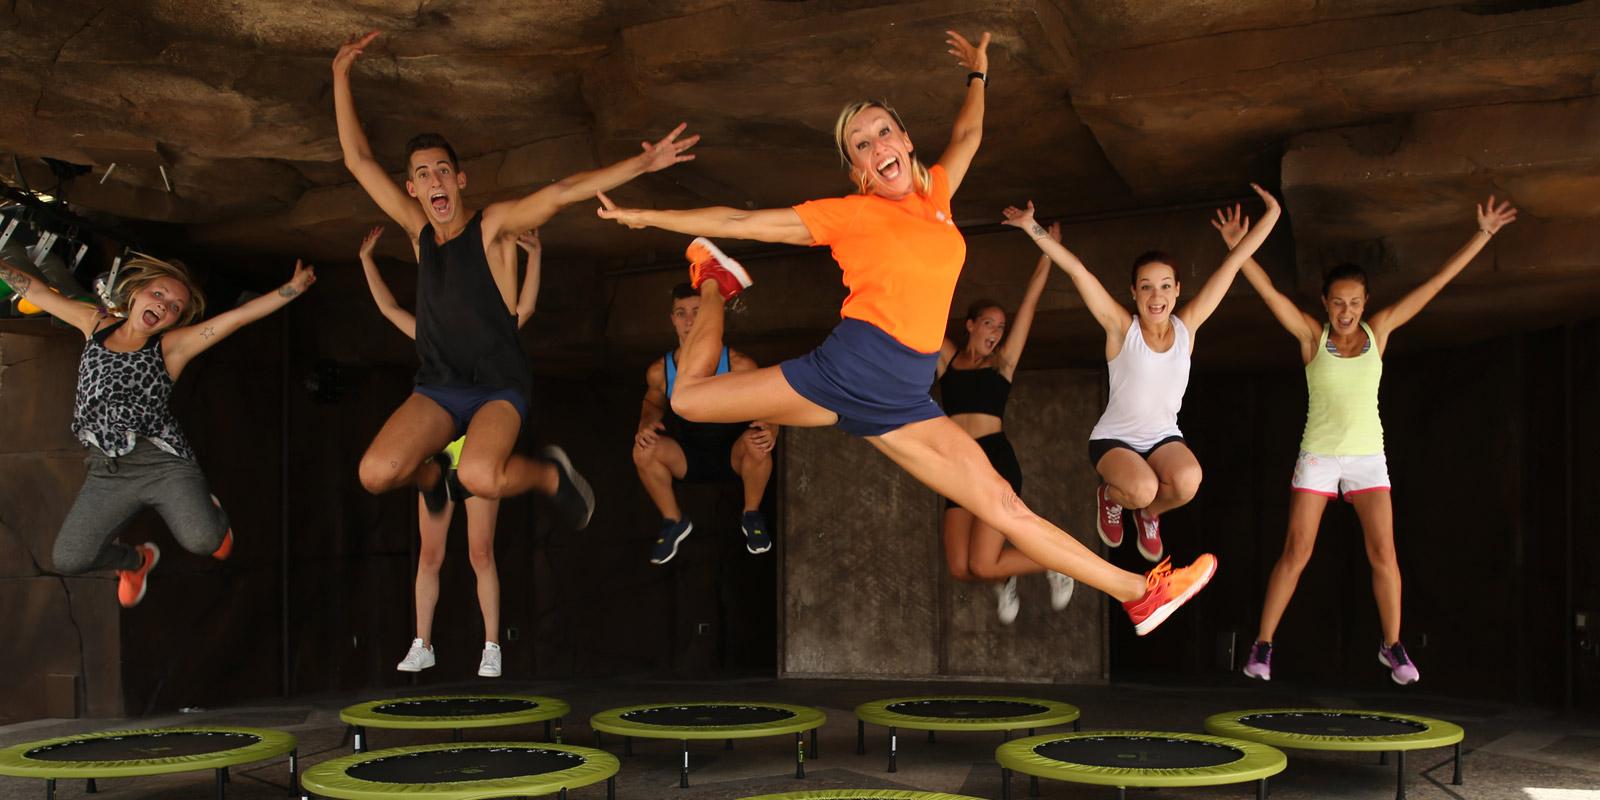 Jumping-programa-fitness-Acttiv-hoteles-camping